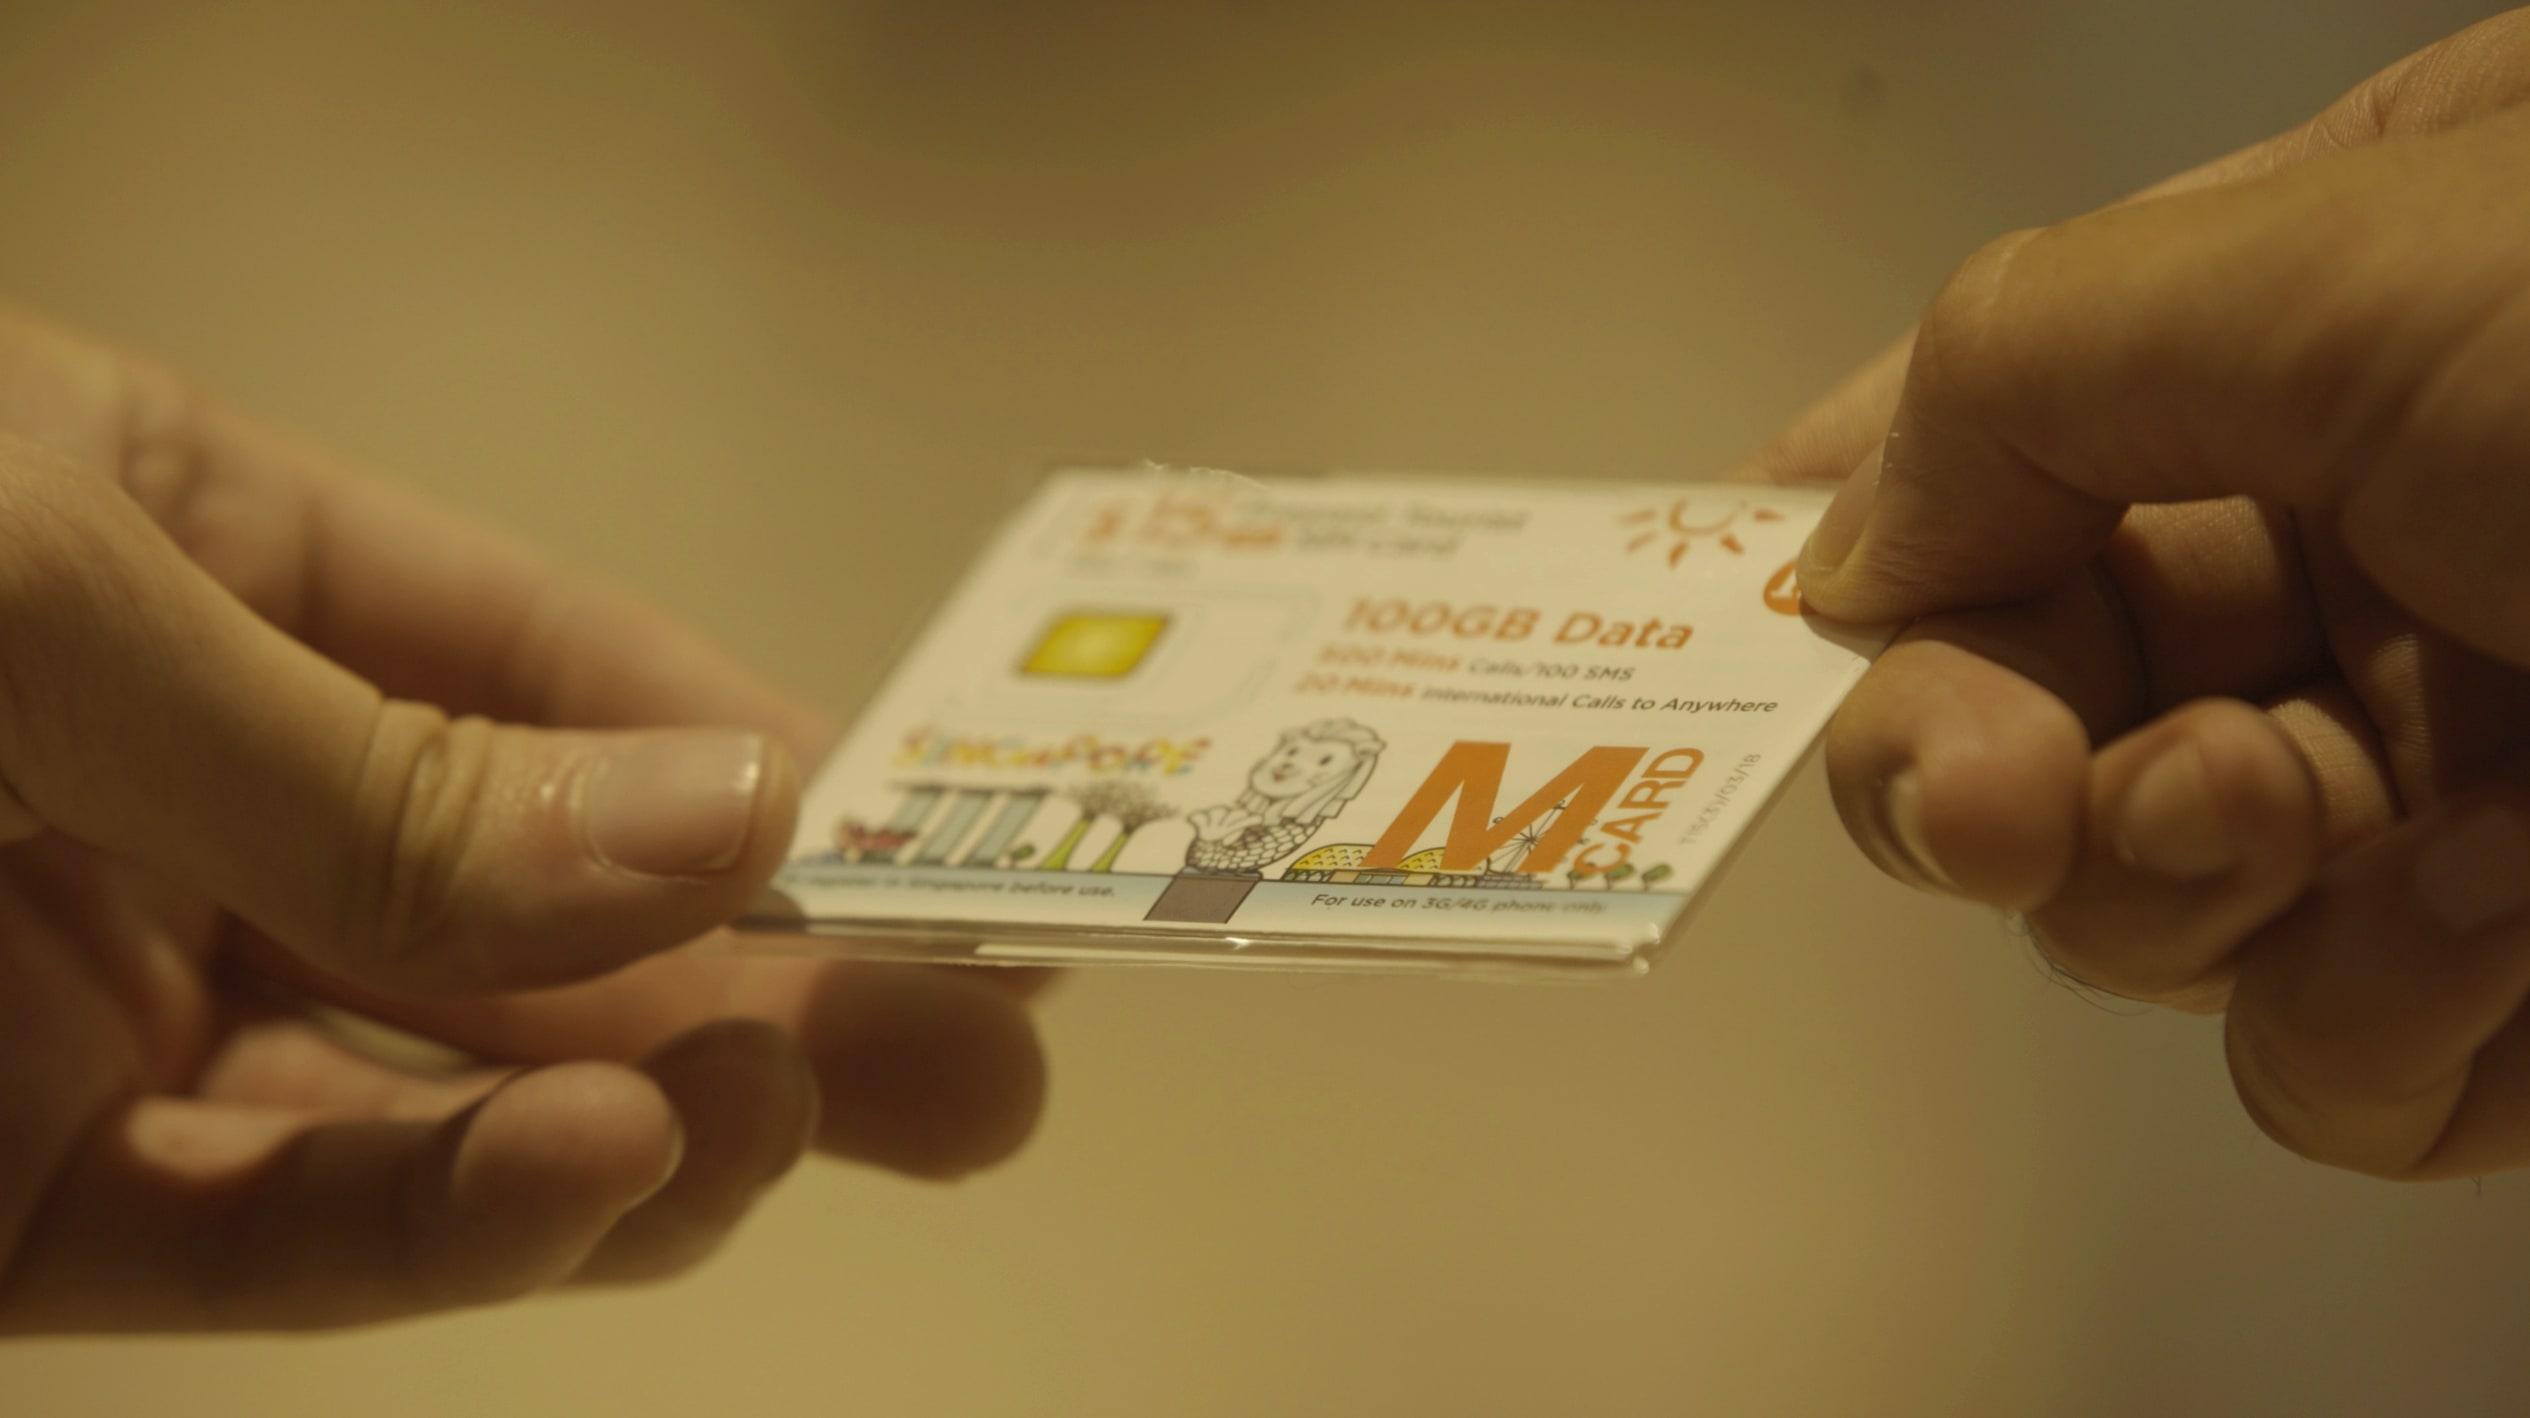 klook singapore gabbi garcia issa pressman sim card